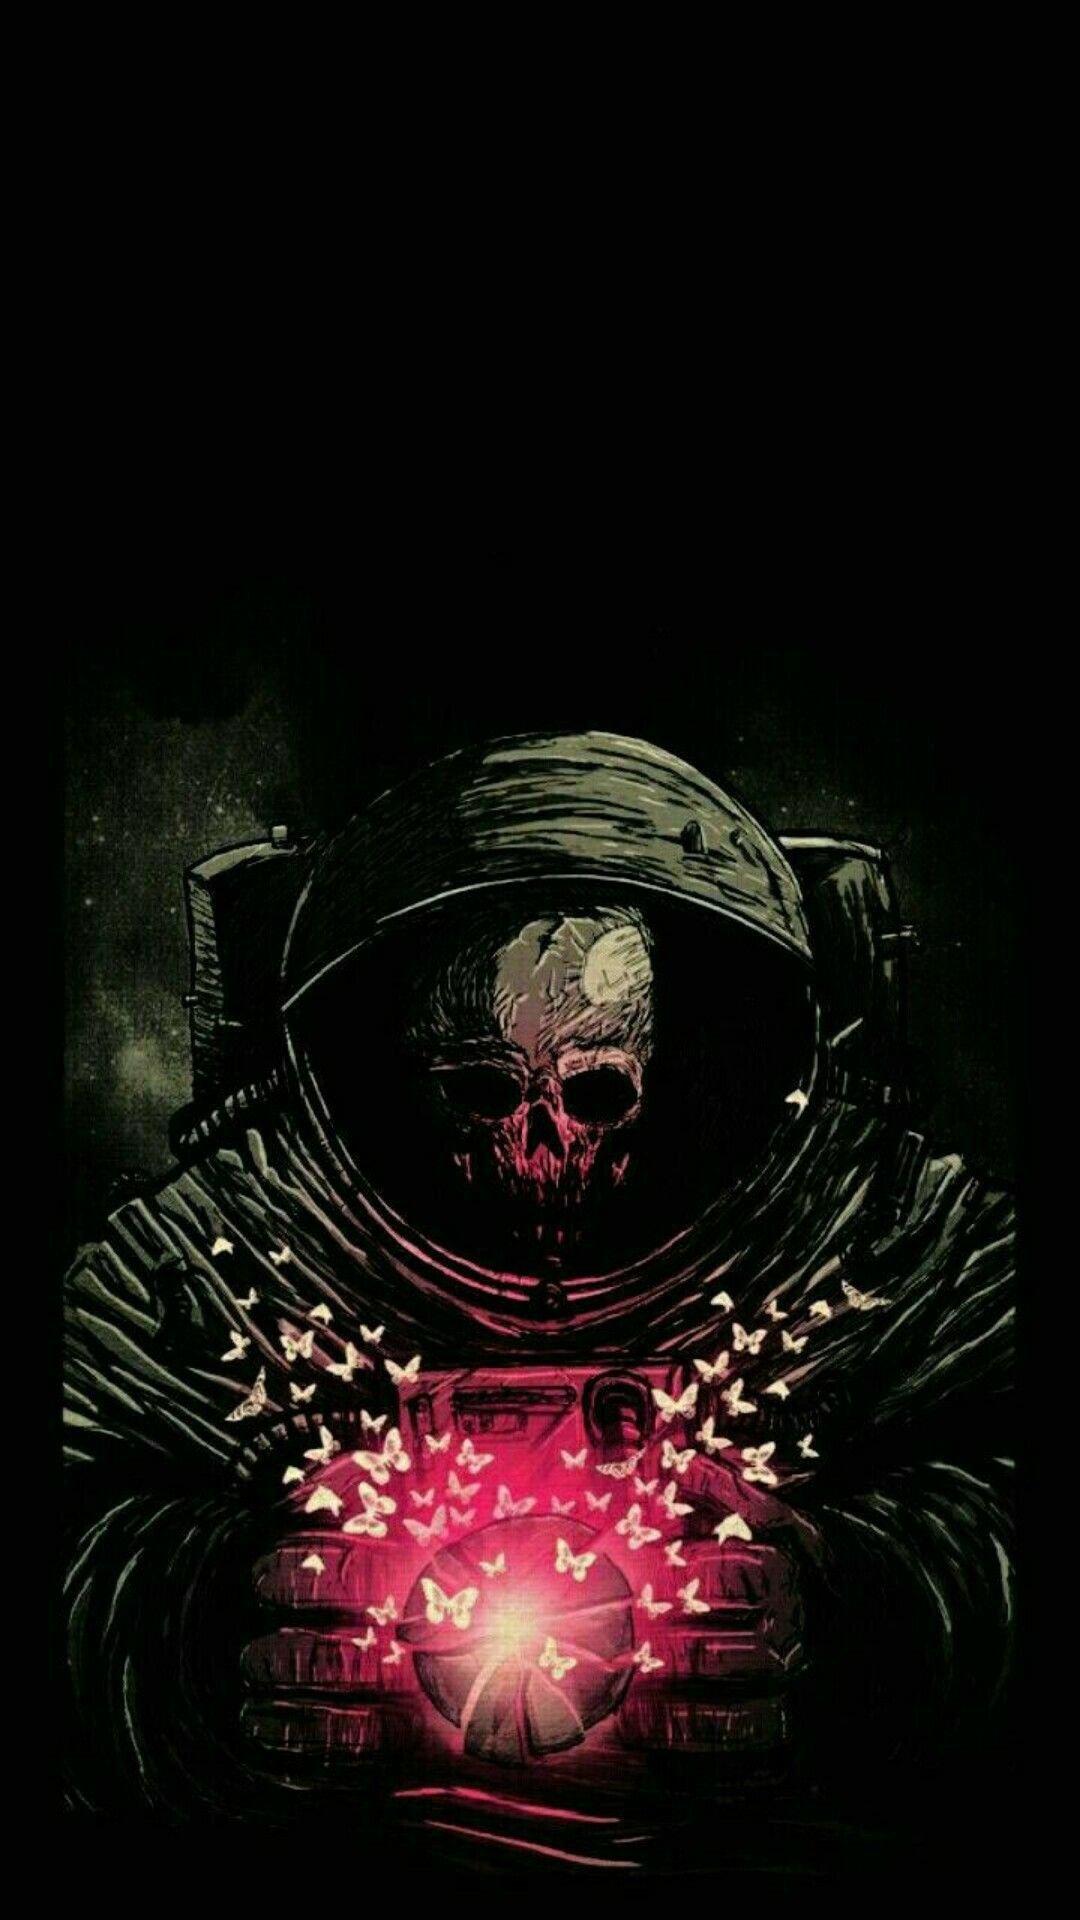 Astronaut Skeleton Art, Skull In Space